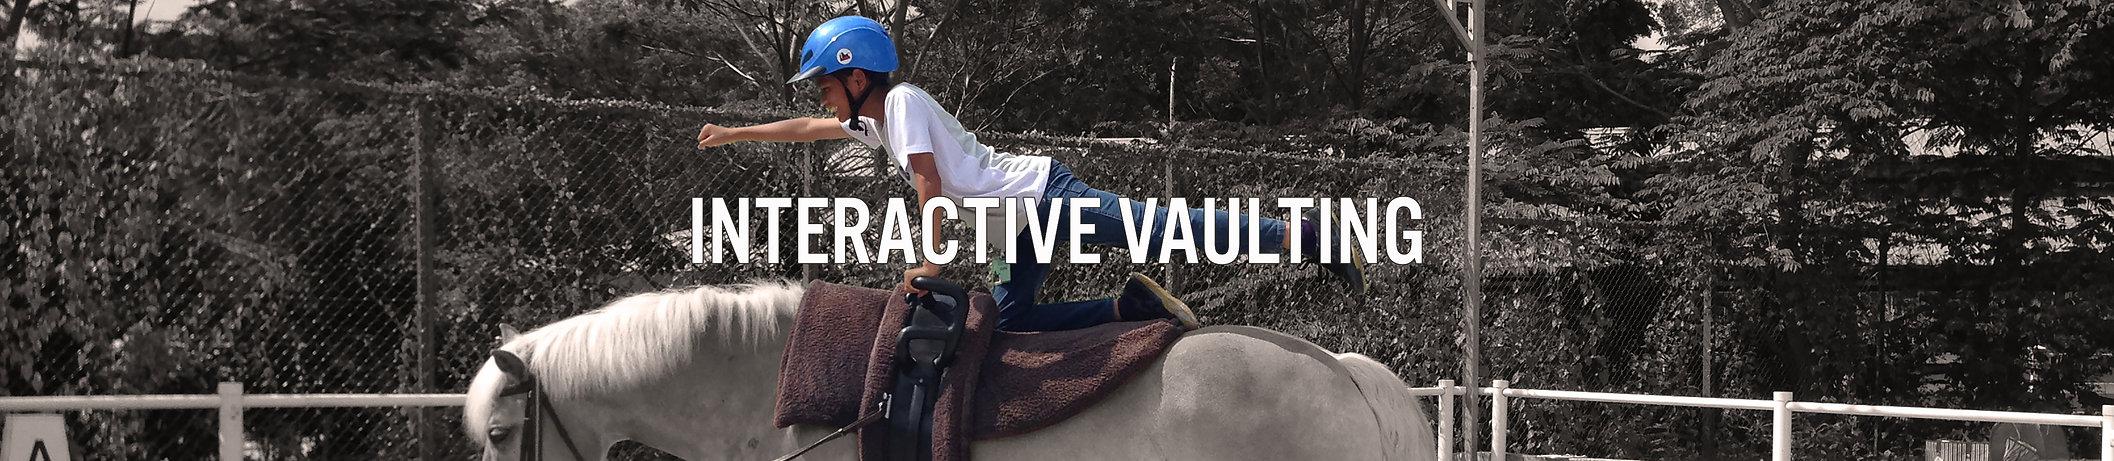 Interactive Vaulting HeaderTEXT.jpg